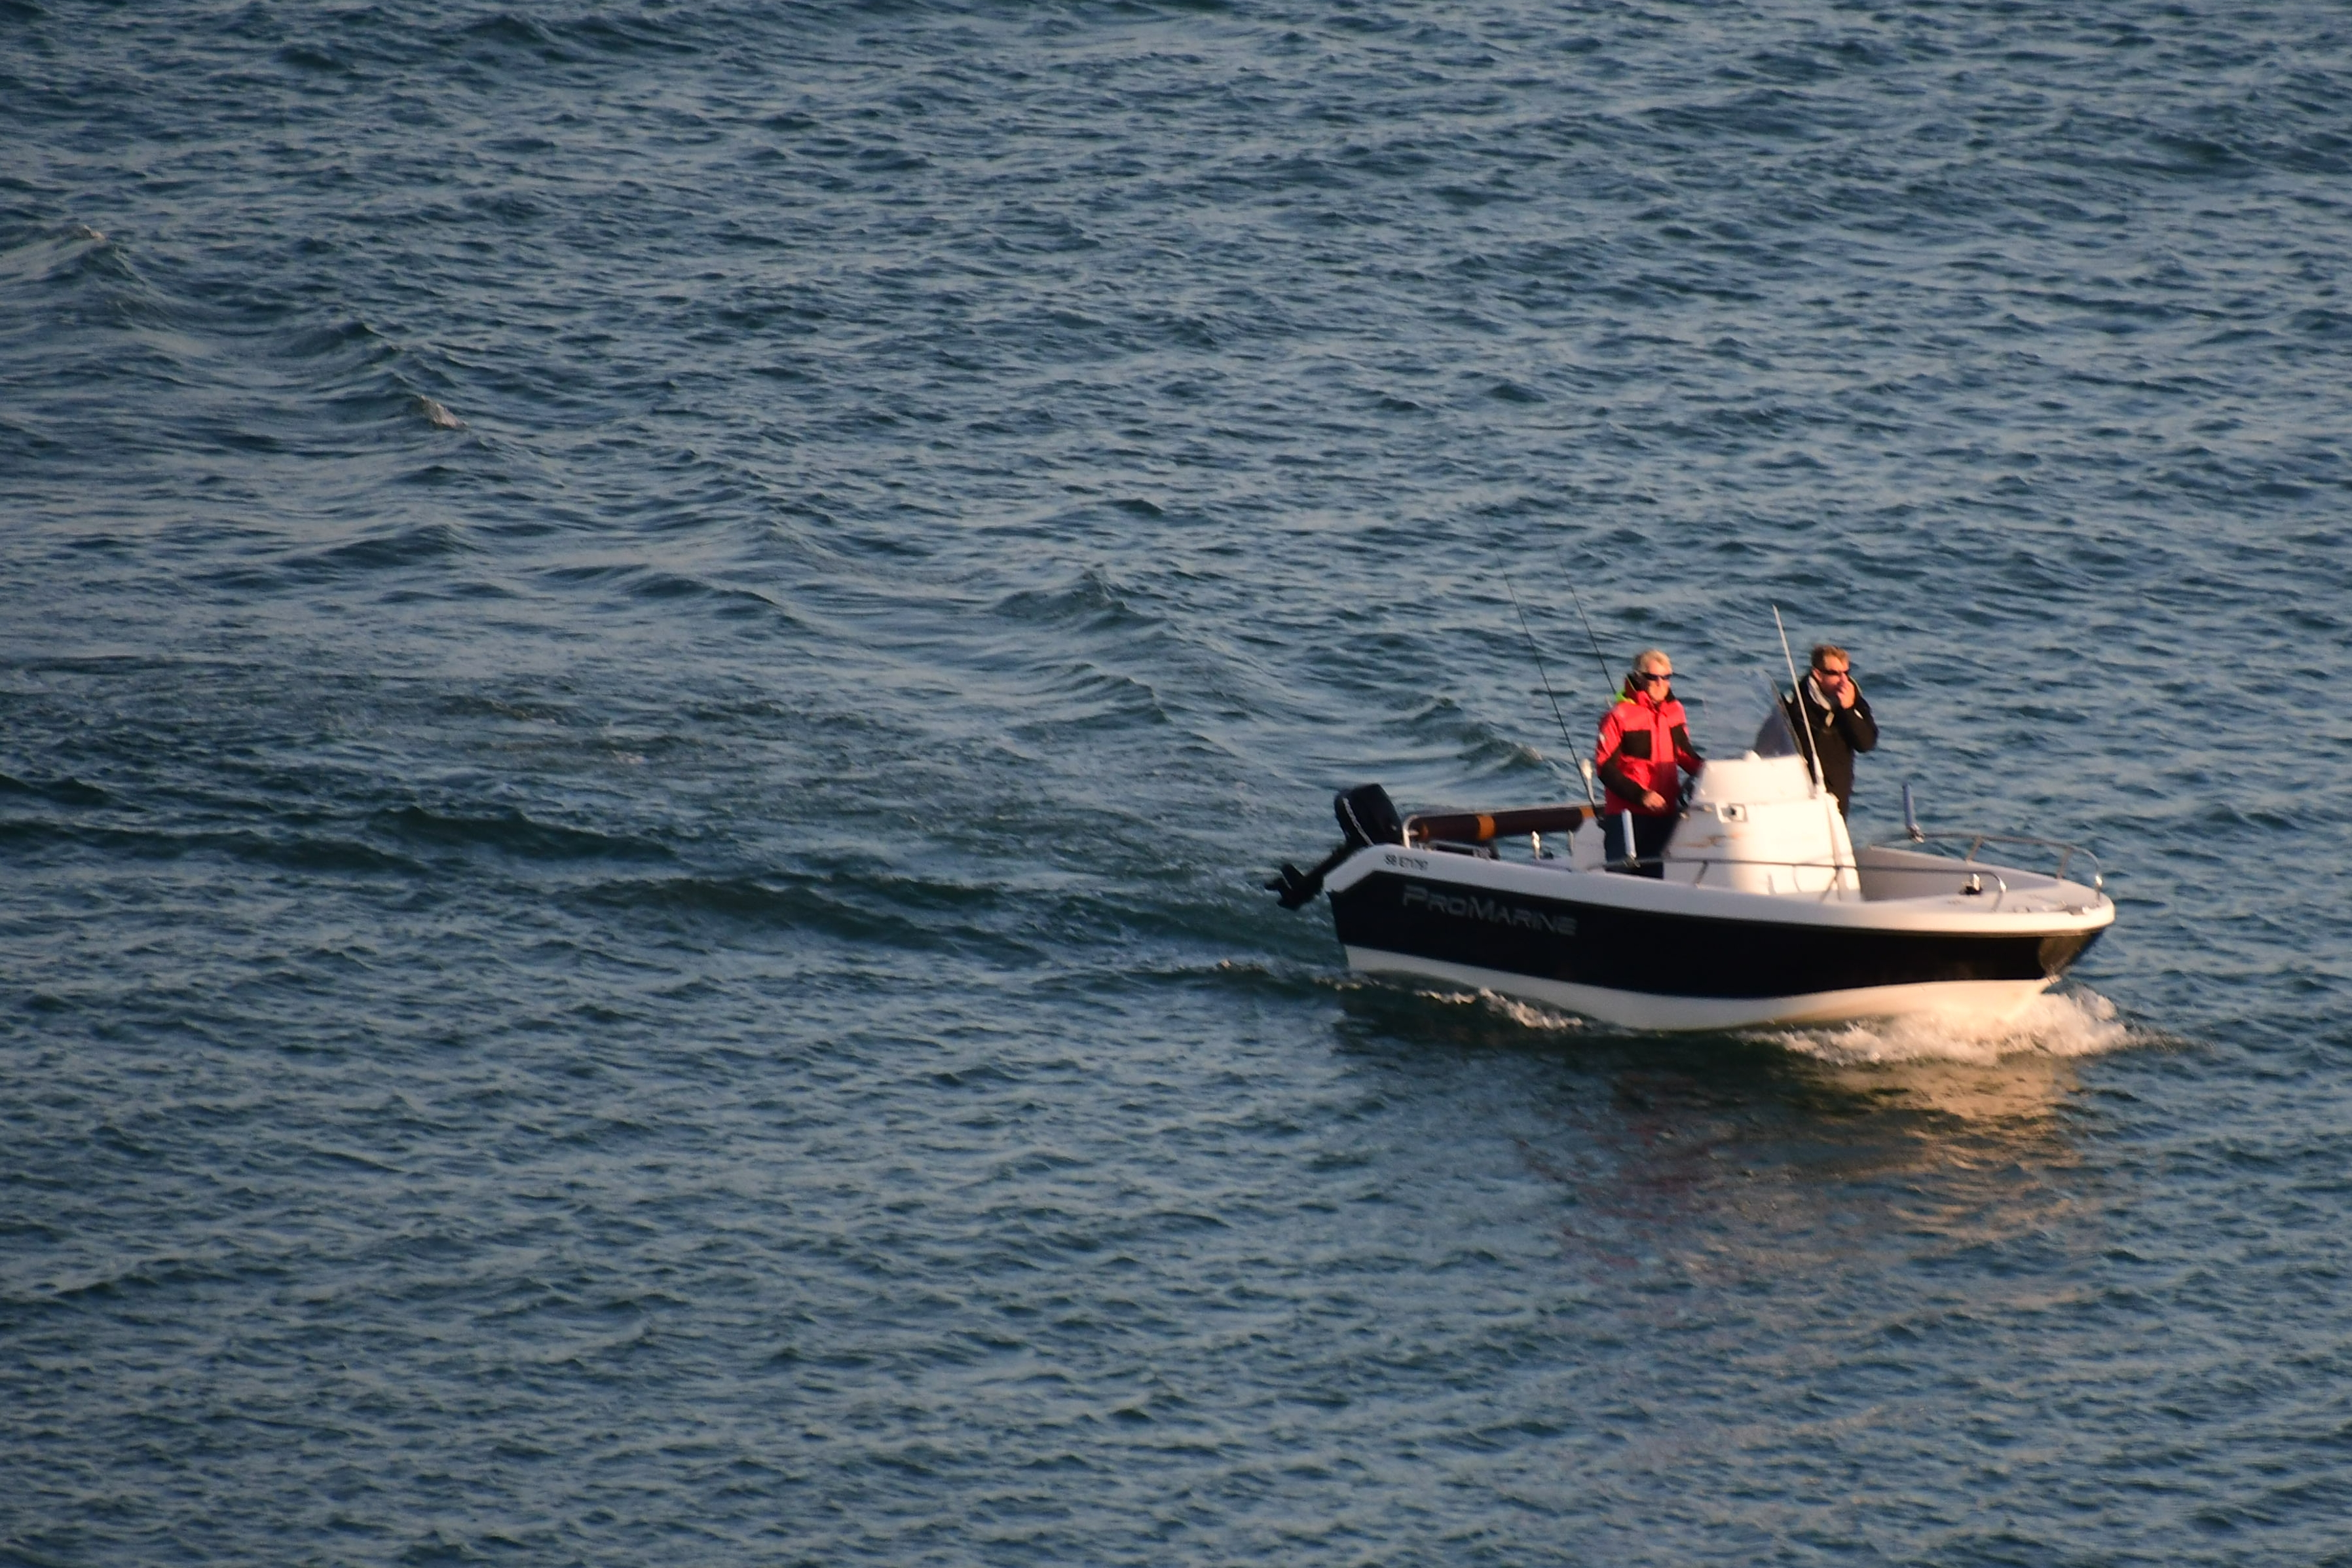 open motor launch fishing boat baie de mont st michel granville manche normandy france eric hall